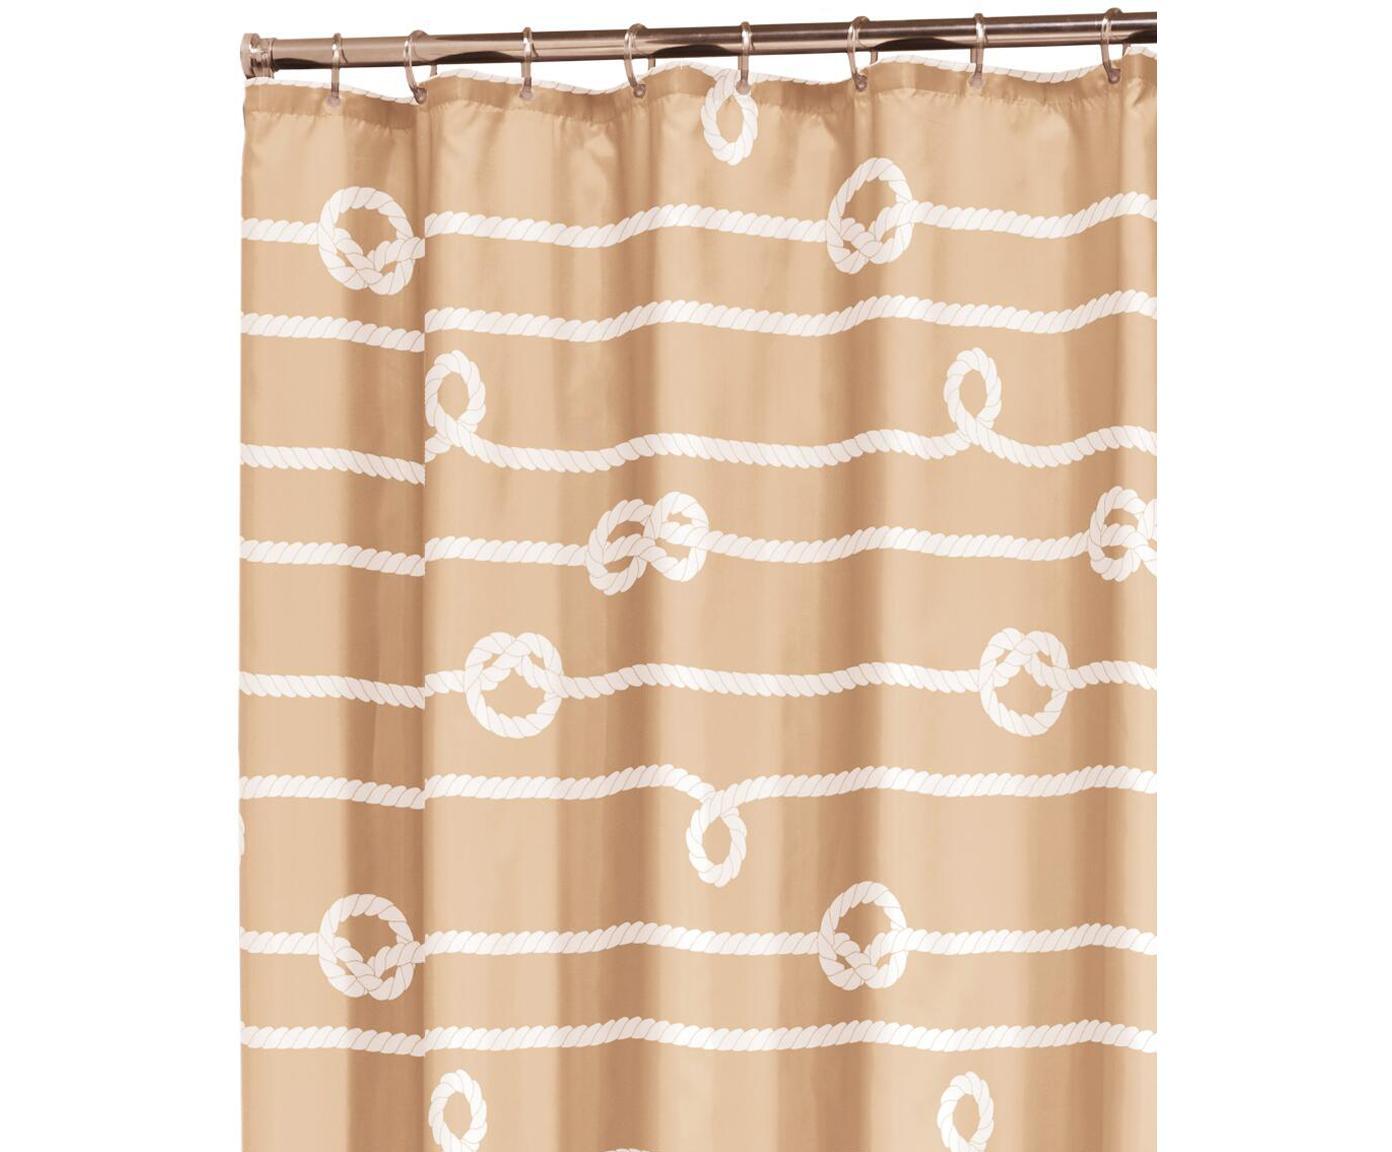 Tenda da doccia Rope, Sabbia, bianco, Larg. 180 x Lung. 200 cm